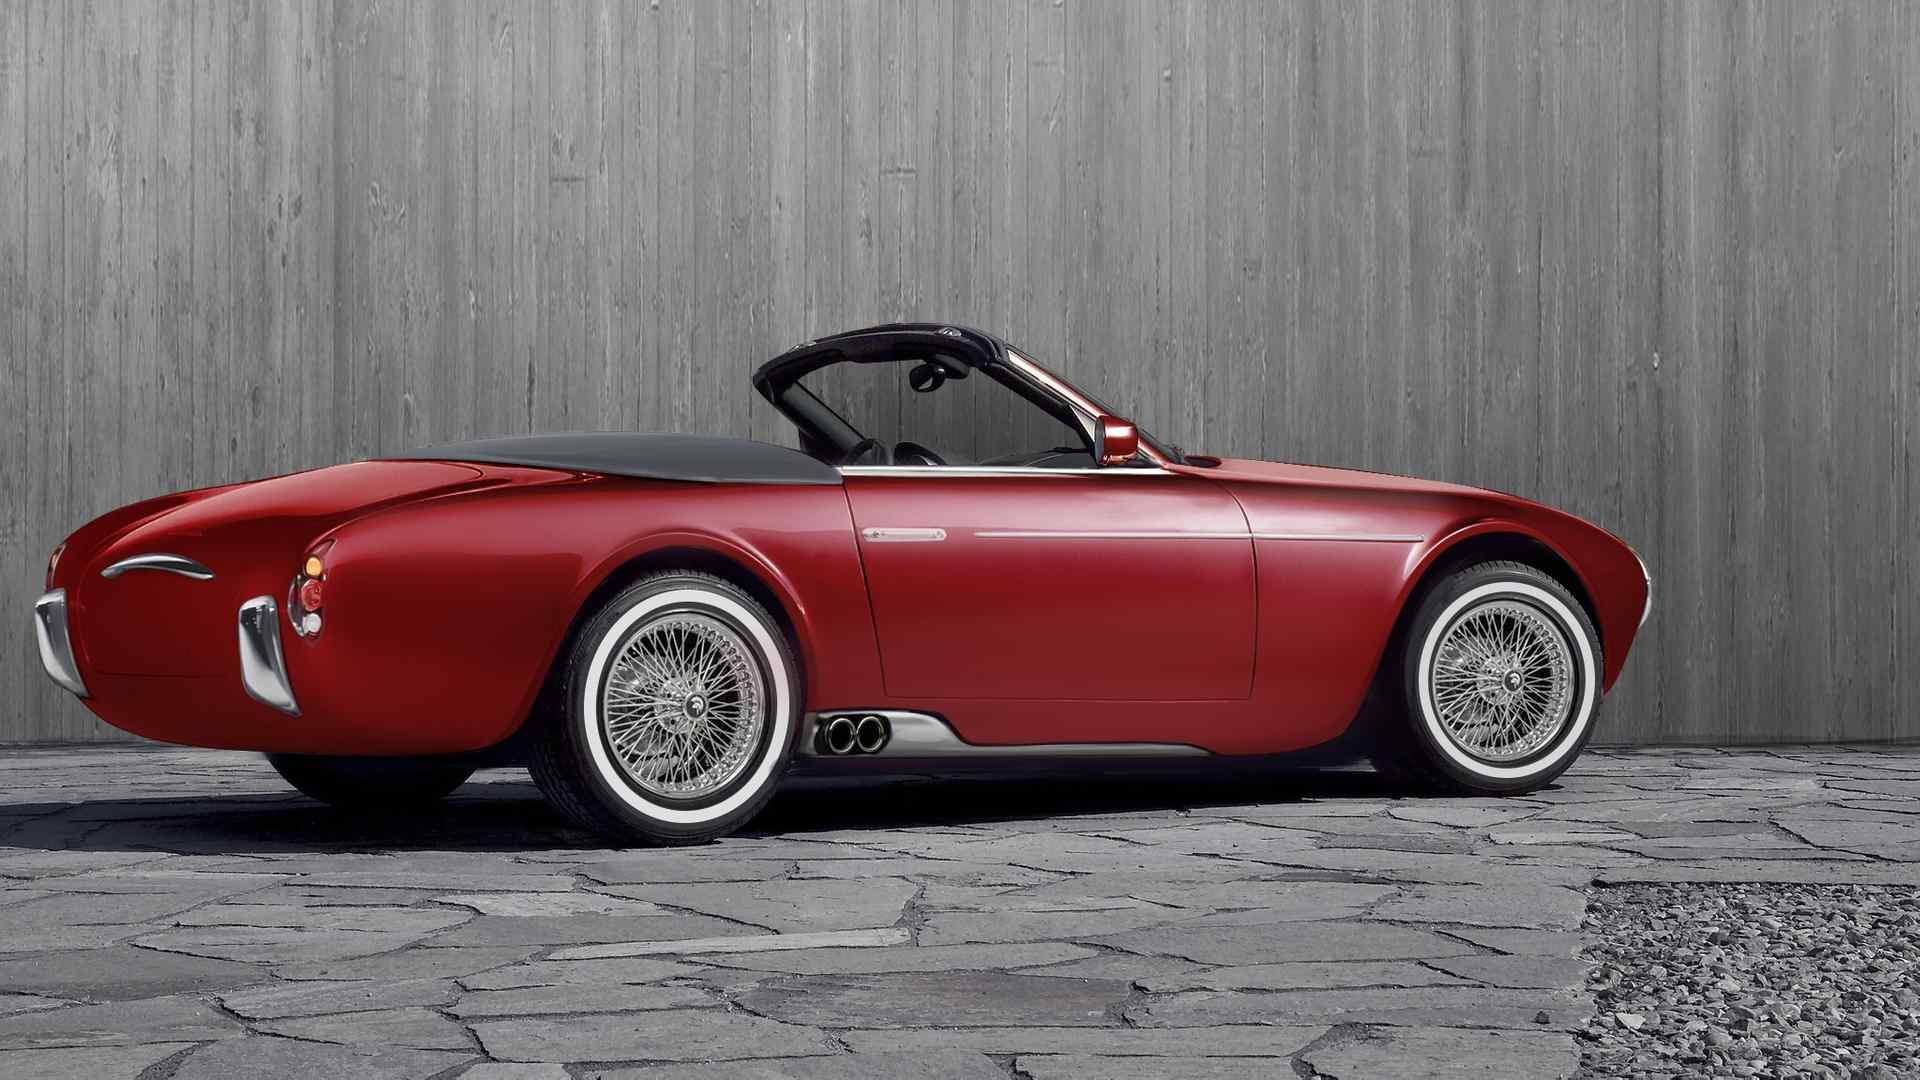 Ares Design сделал Project Wami в стиле Maserati 50-х 2